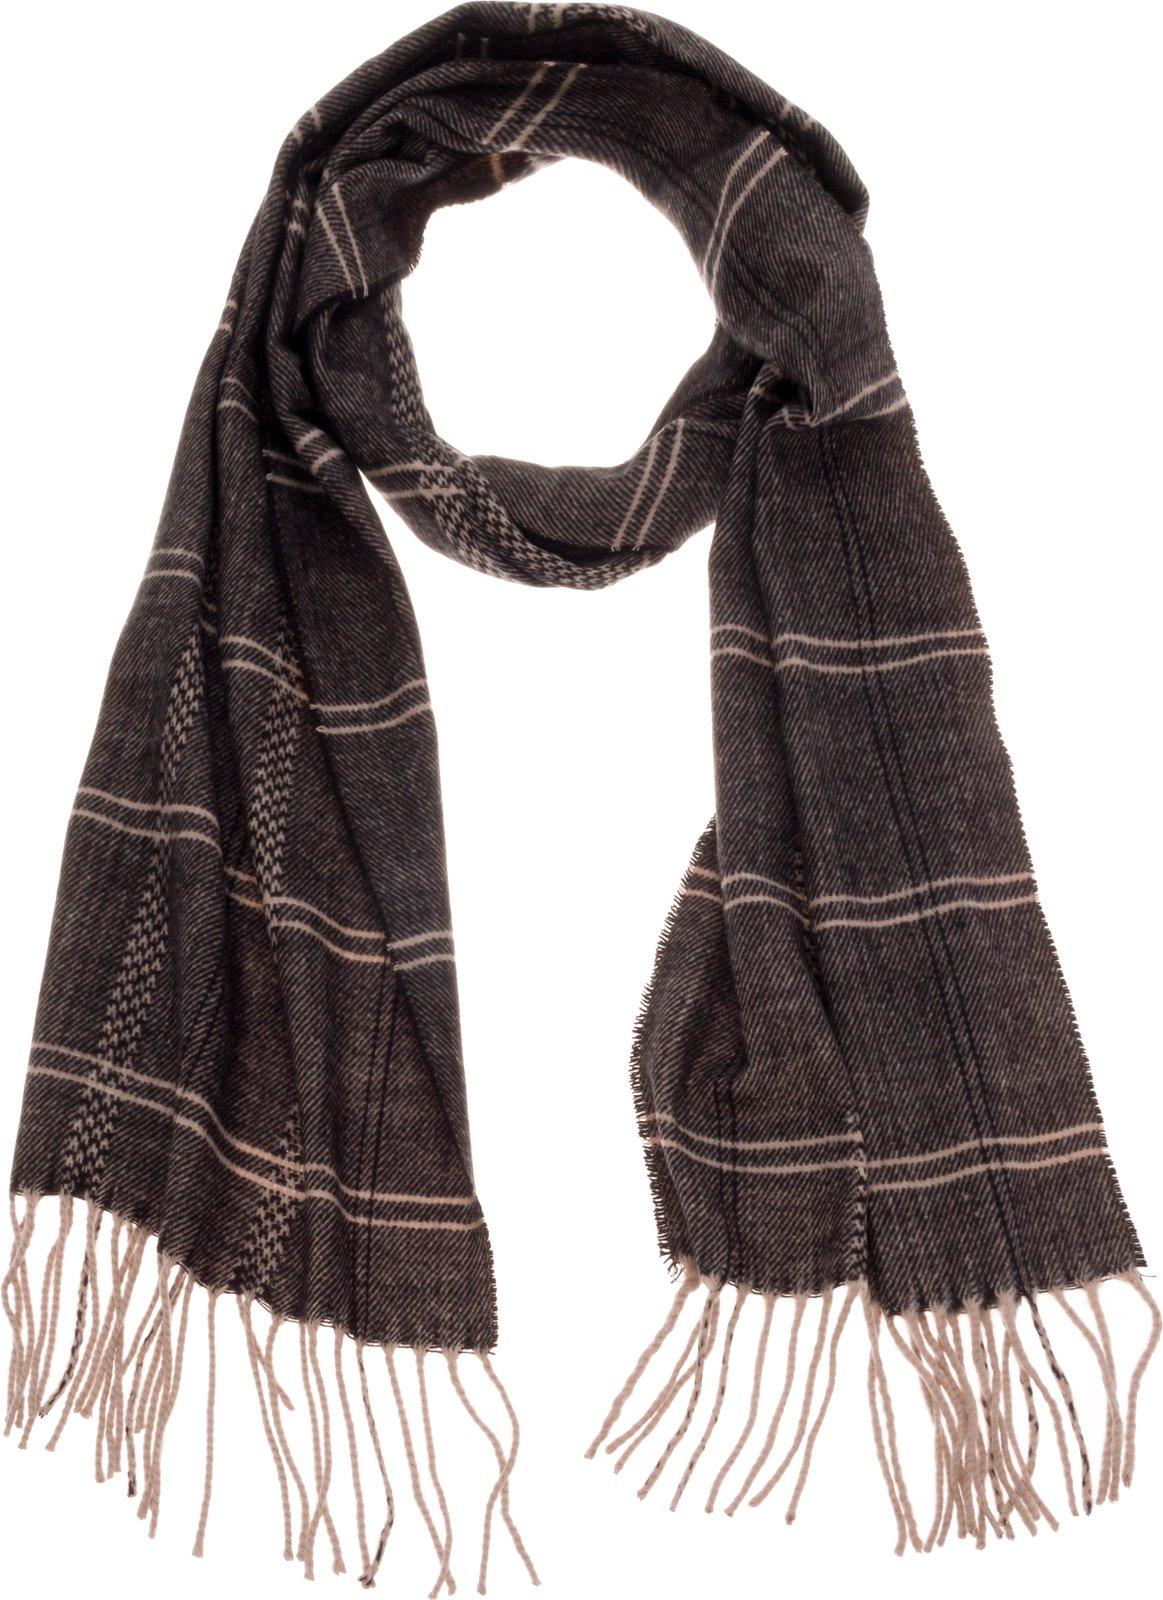 SilverHooks Soft & Warm Plaid Cashmere Scarf w/Gift Box (Cream & Black Stripe)